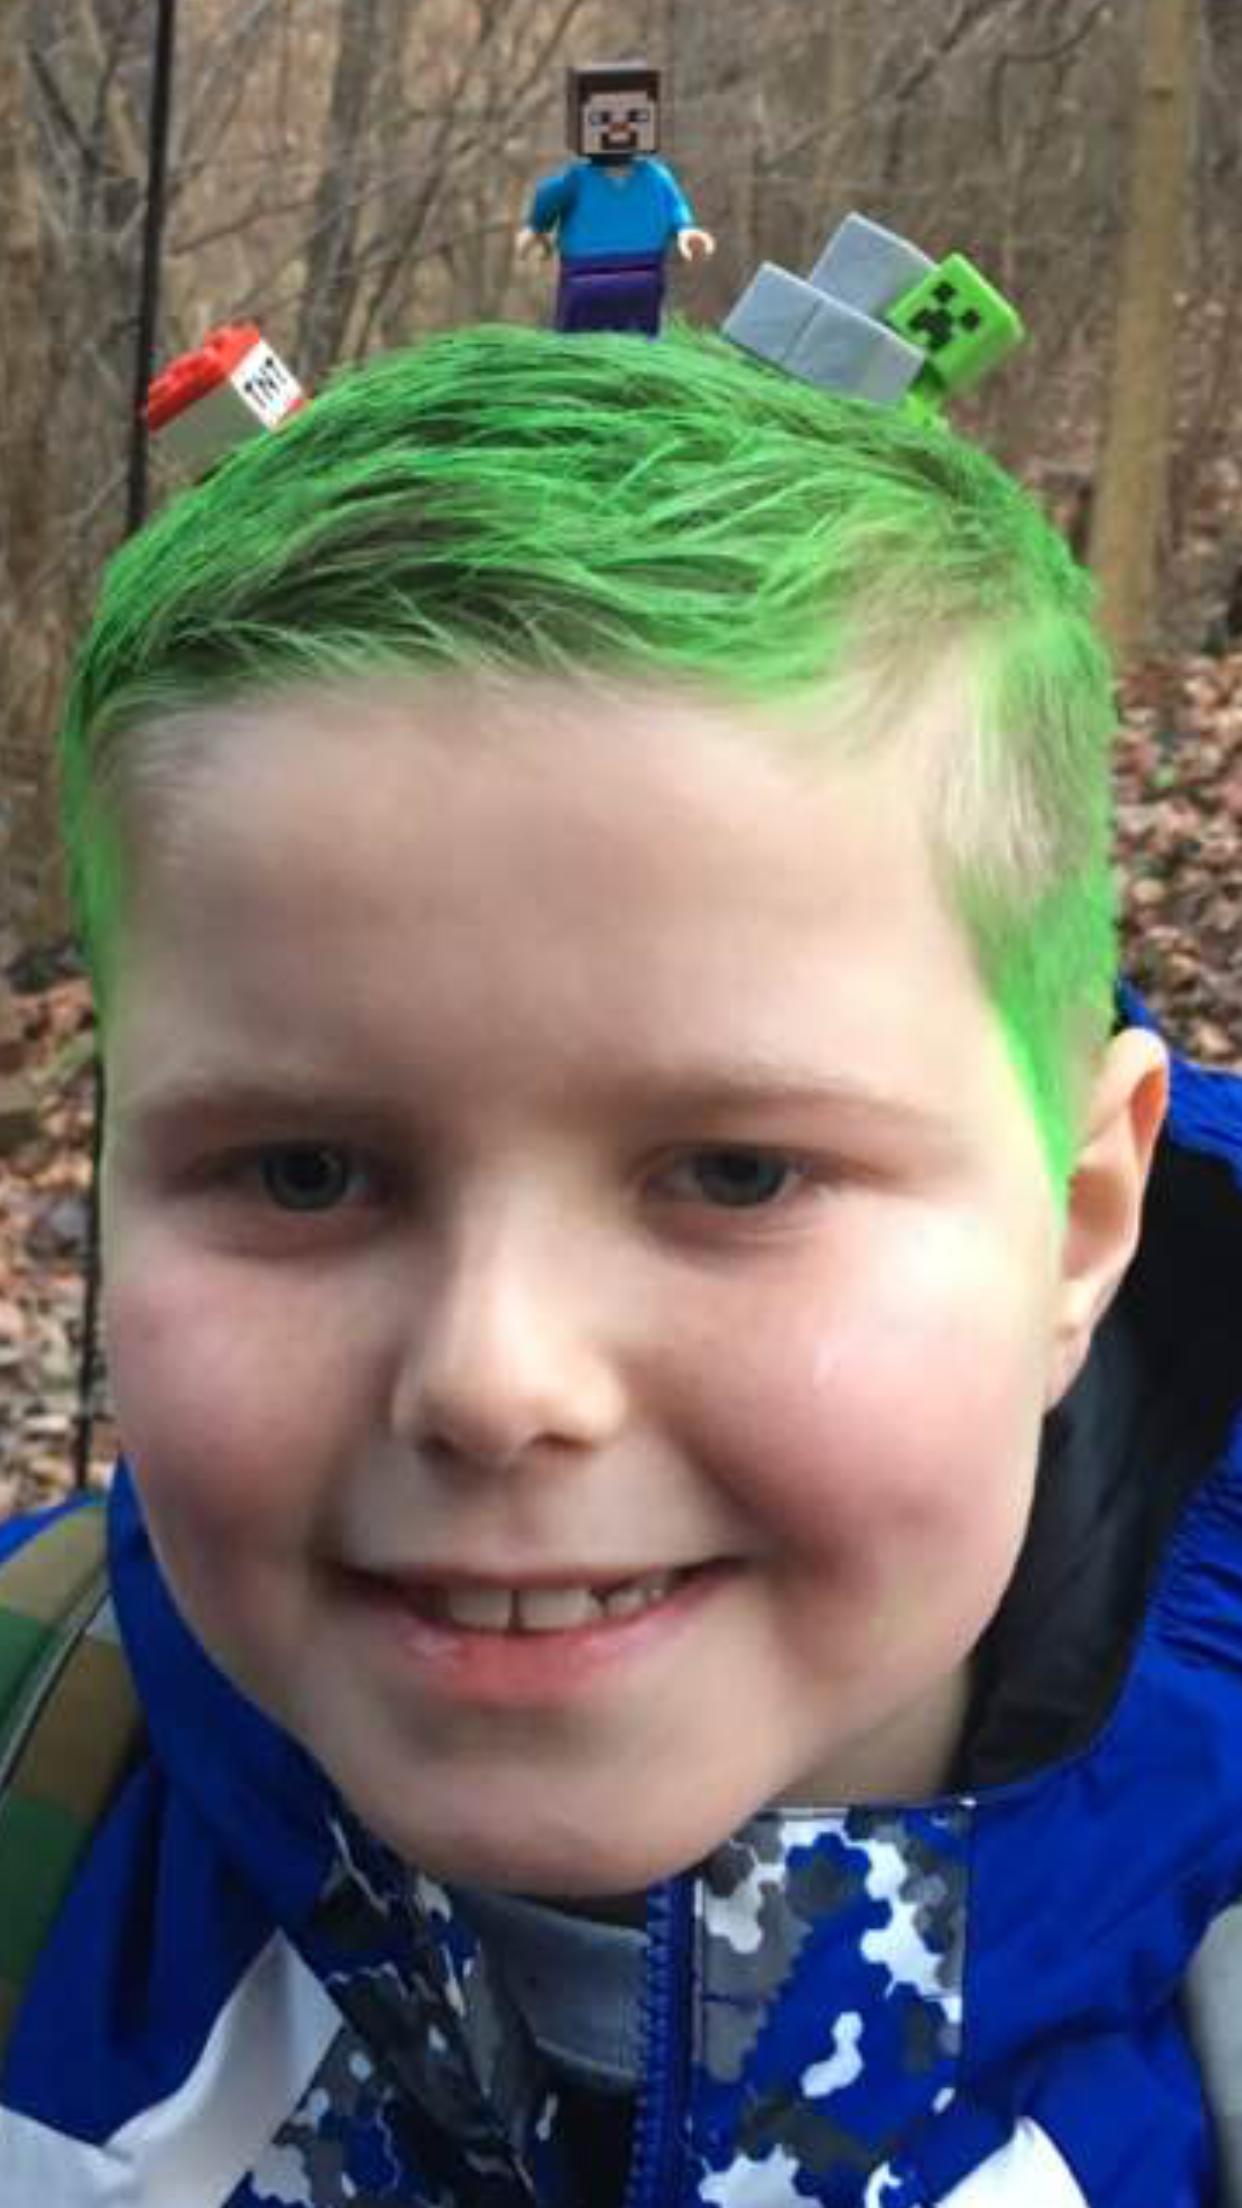 Crazy Hair Day Minecraft Theme Temporary Green Hair Dye Spray Use